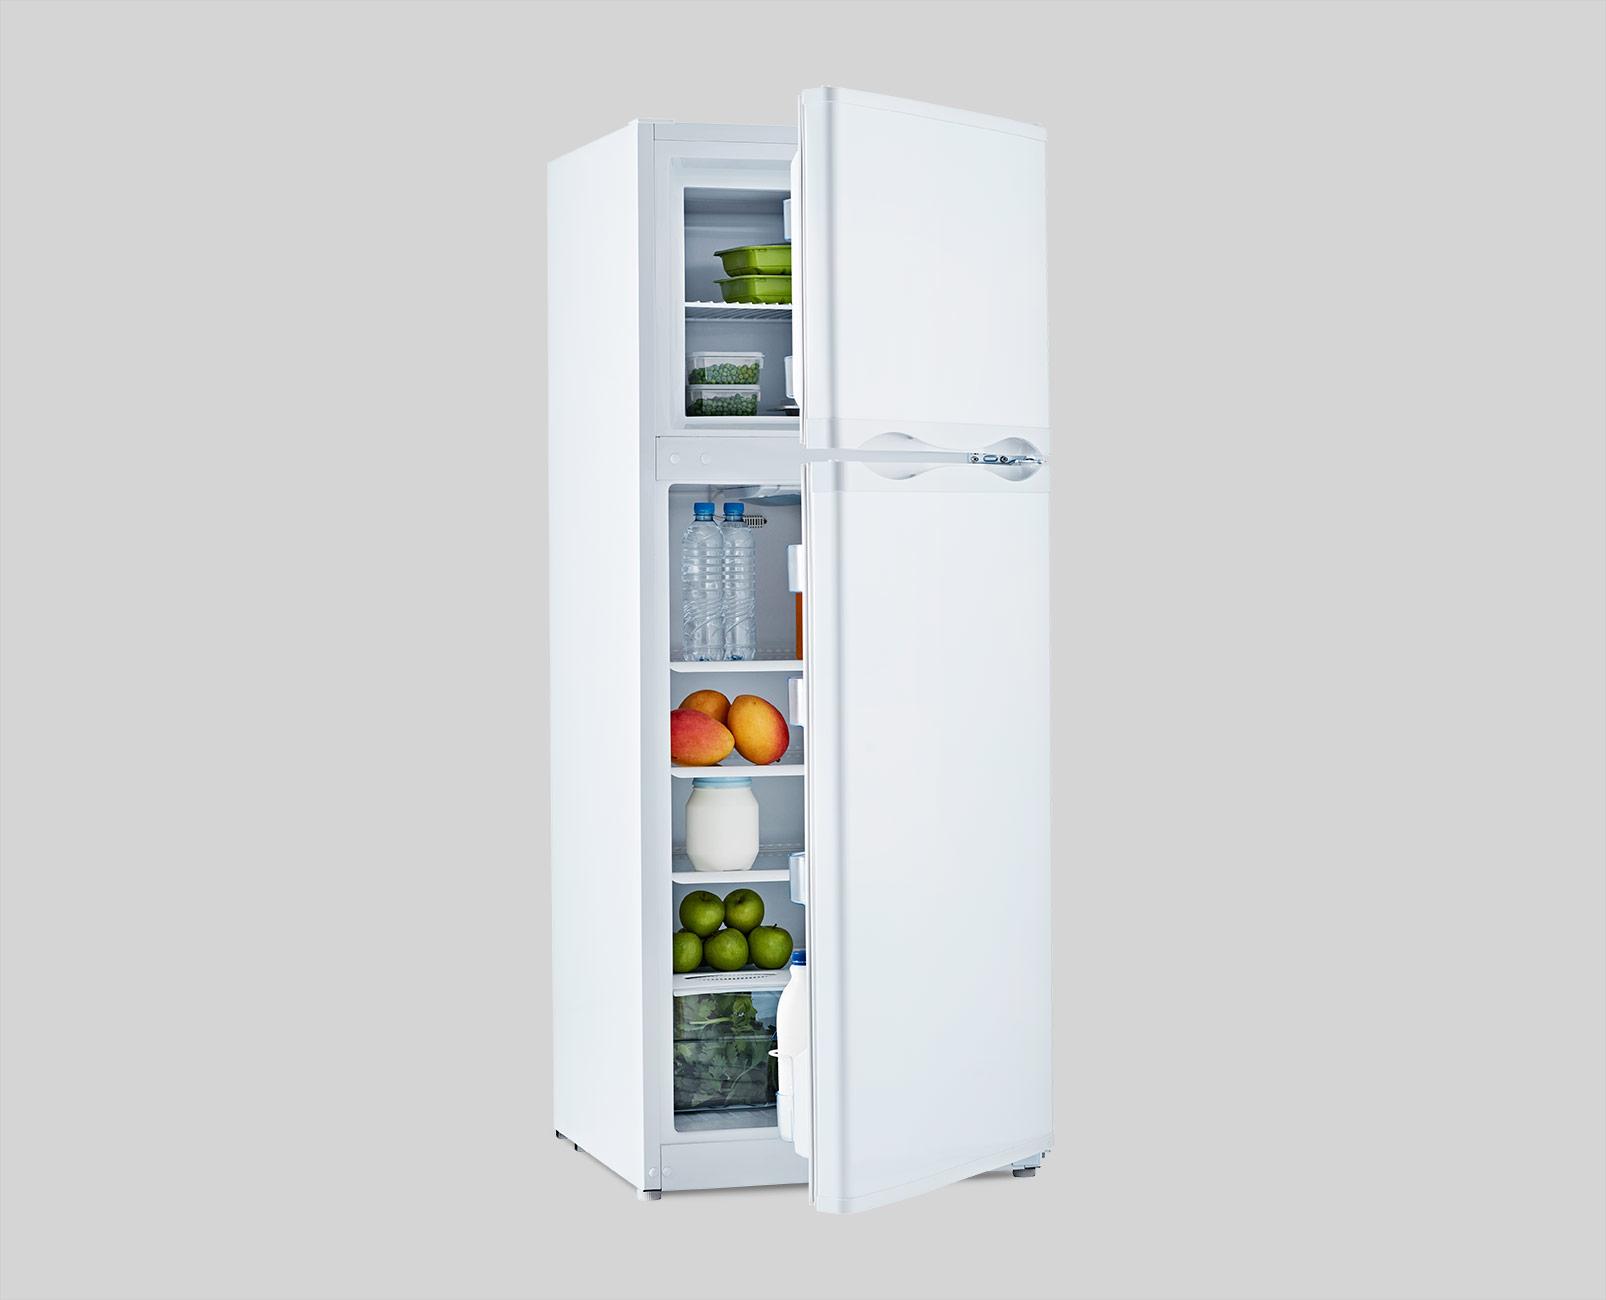 DC285 Arcticold 12v/24v Fridge/Freezer